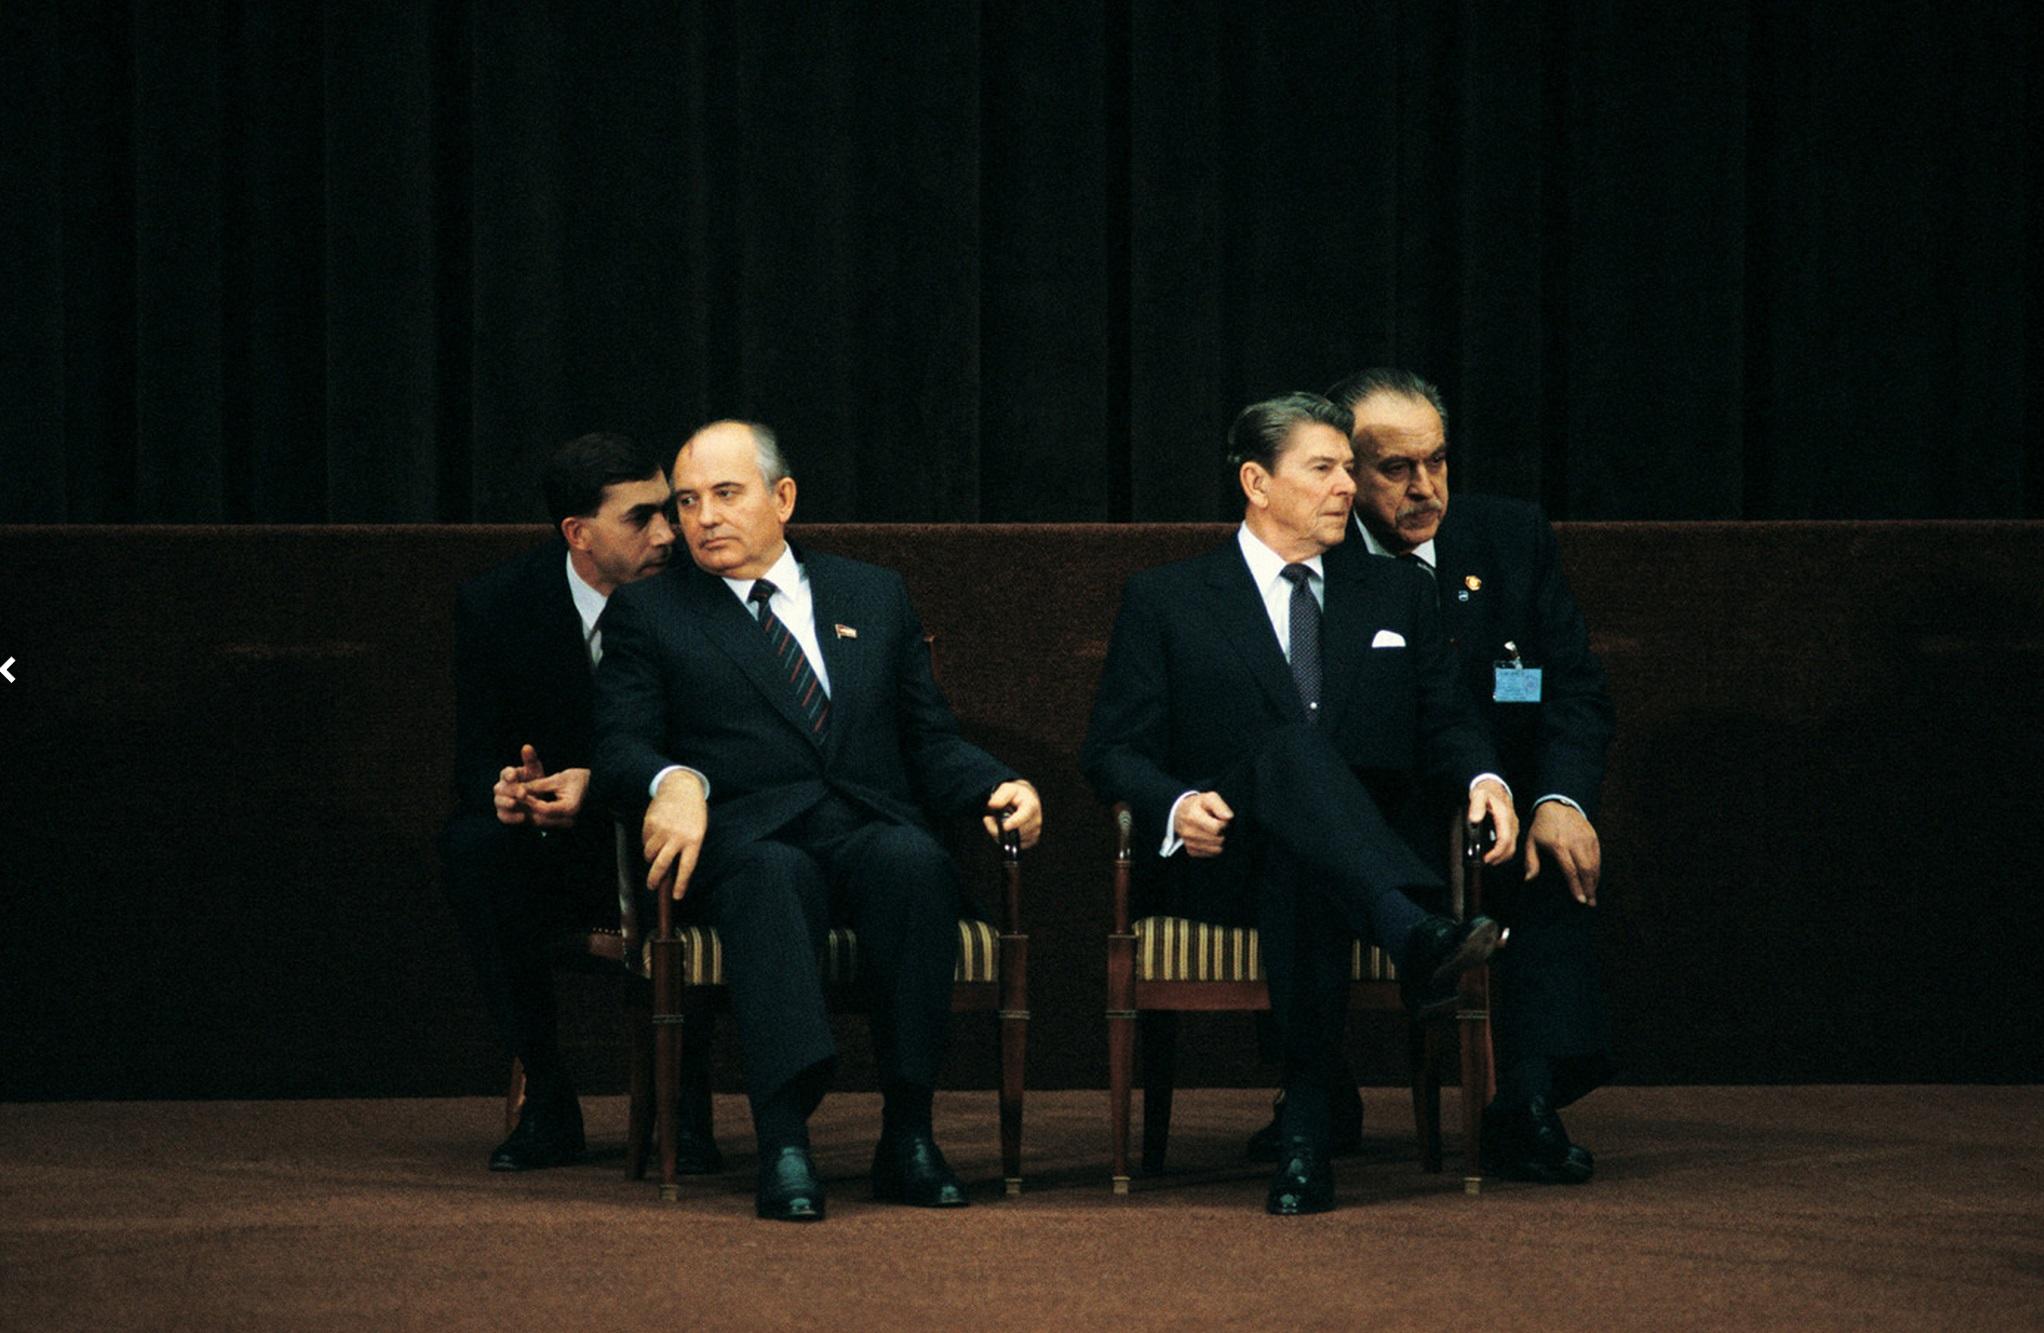 The First Gorbachev & Reagan Summit, Geneva, November 19, 1985. © 2015 David Burnett/Contact Press Images